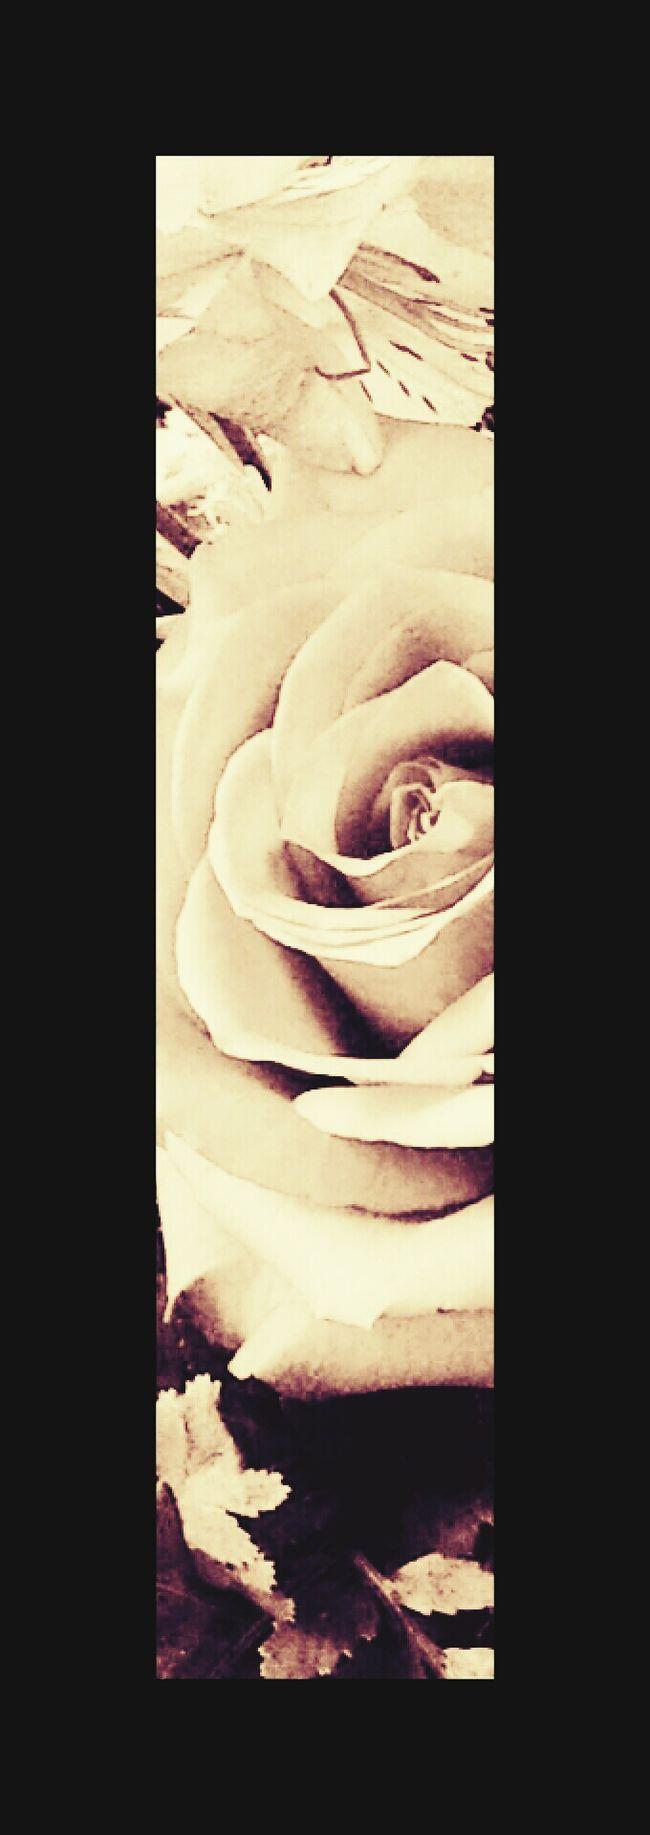 Maggie_Noir Black Magic Flower Porn